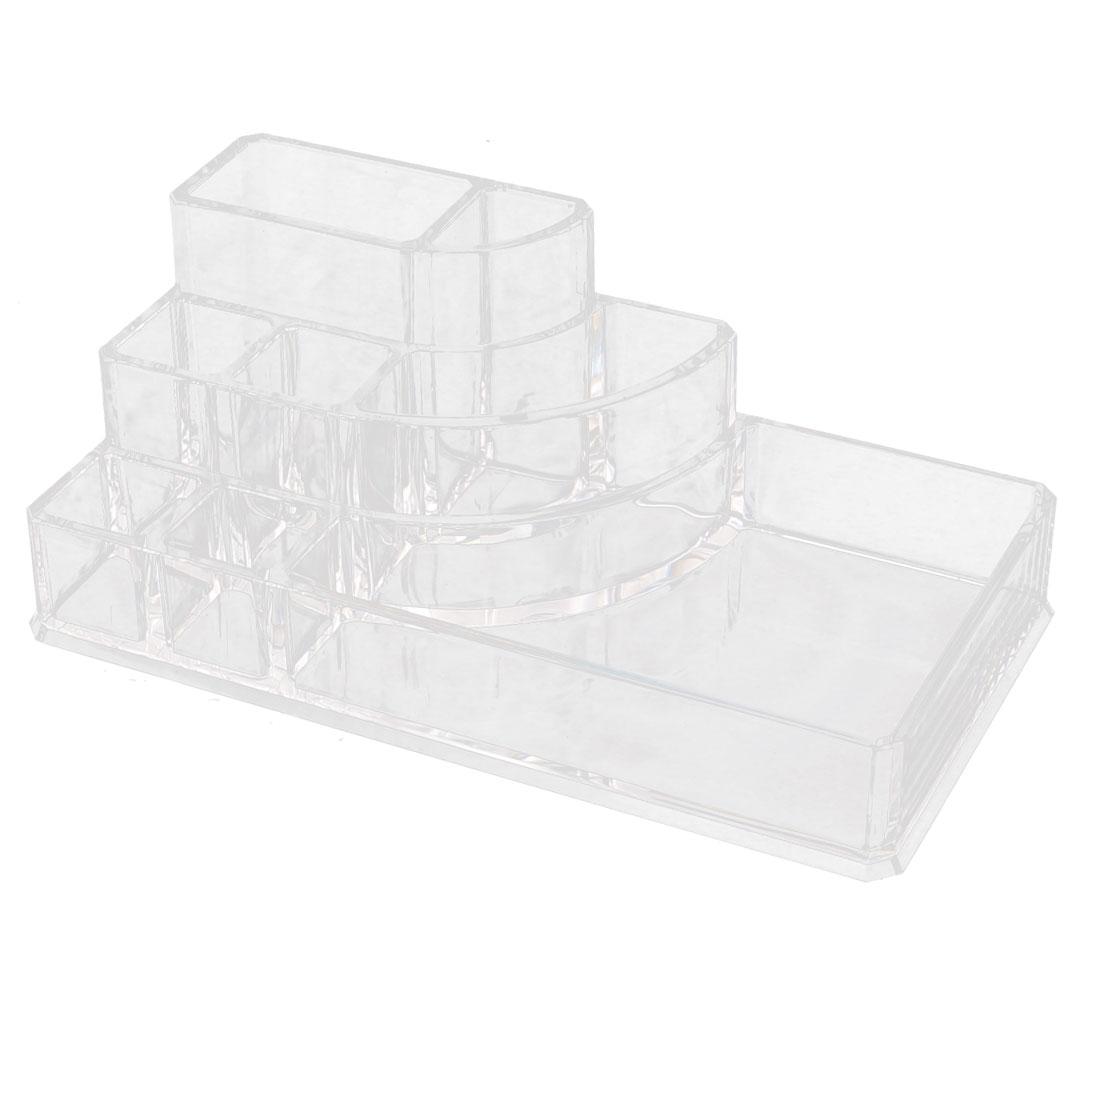 Acrylic 8 Slots Lipstick Lipliner Storage Case Jewelry Box Organizer Clear